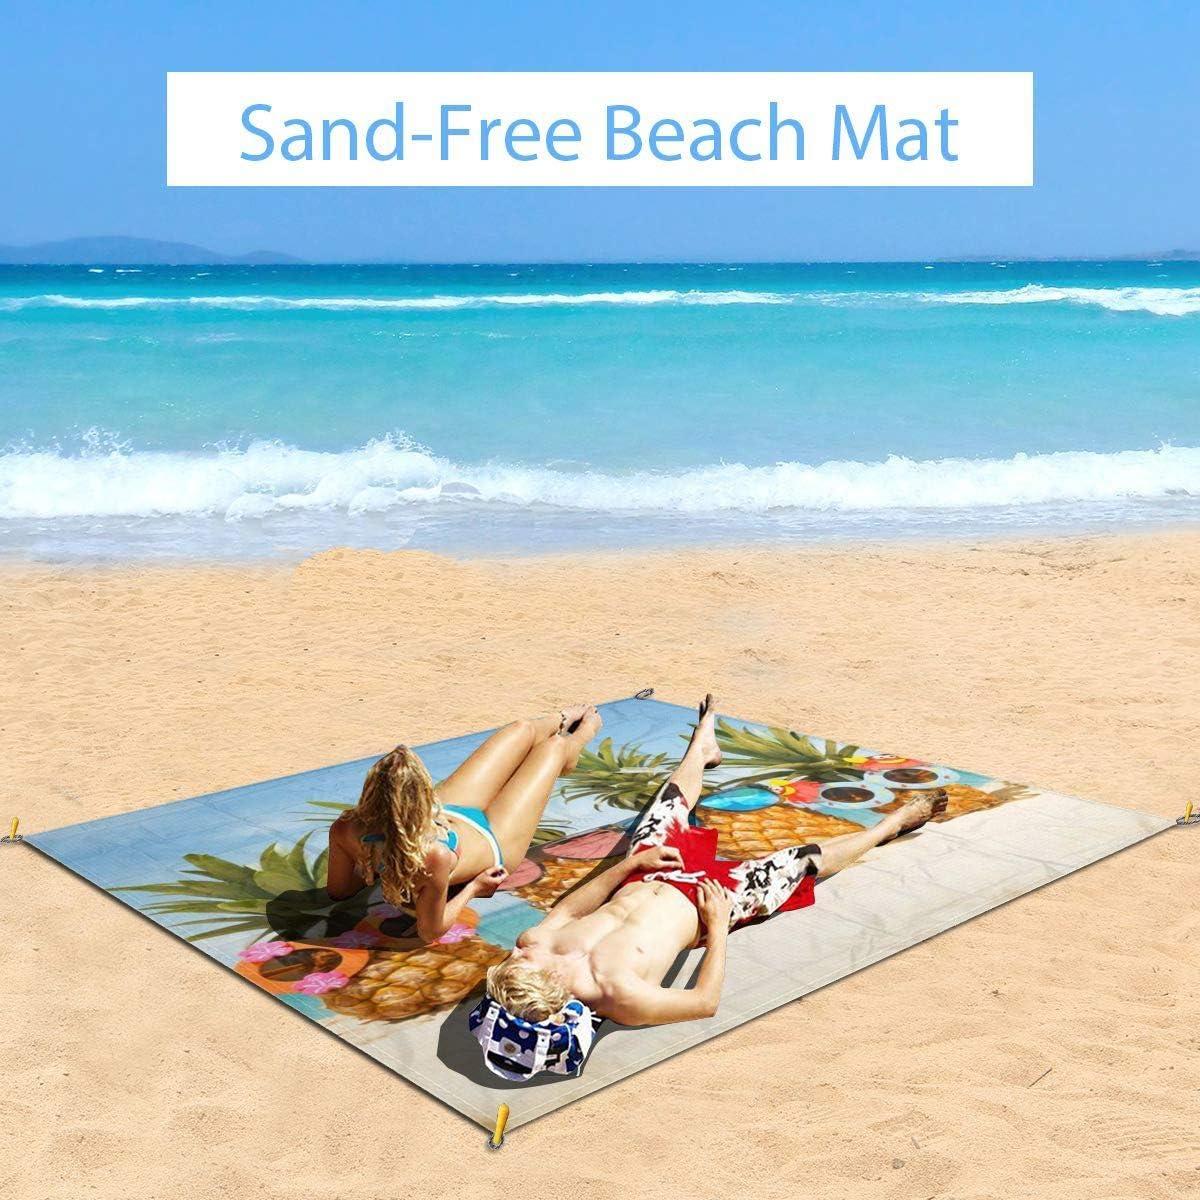 Oversized Stadium Blanket Quick Drying Sand Free Ground//Grass Mat for Beach Music Festival Travel Beach Pineapple Compact Duarable Beach Blanket Camping Blanket CENSIHER Picnic Blanket